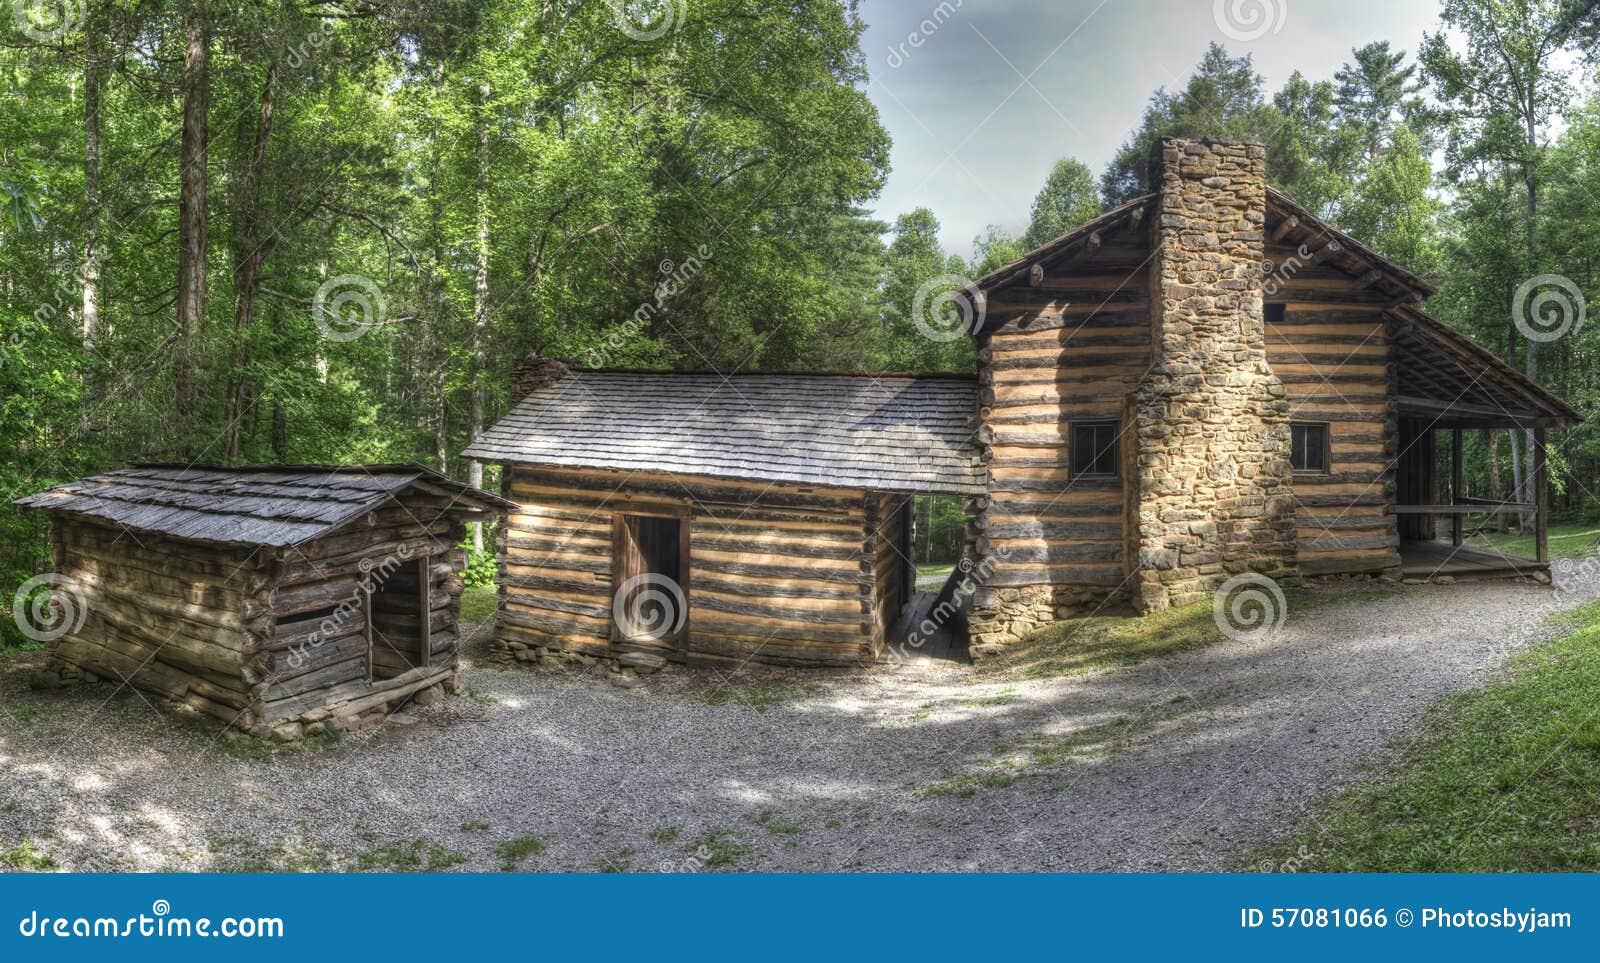 Elijah Oliver Log Cabin Great Smoky Mountains National Park Stock